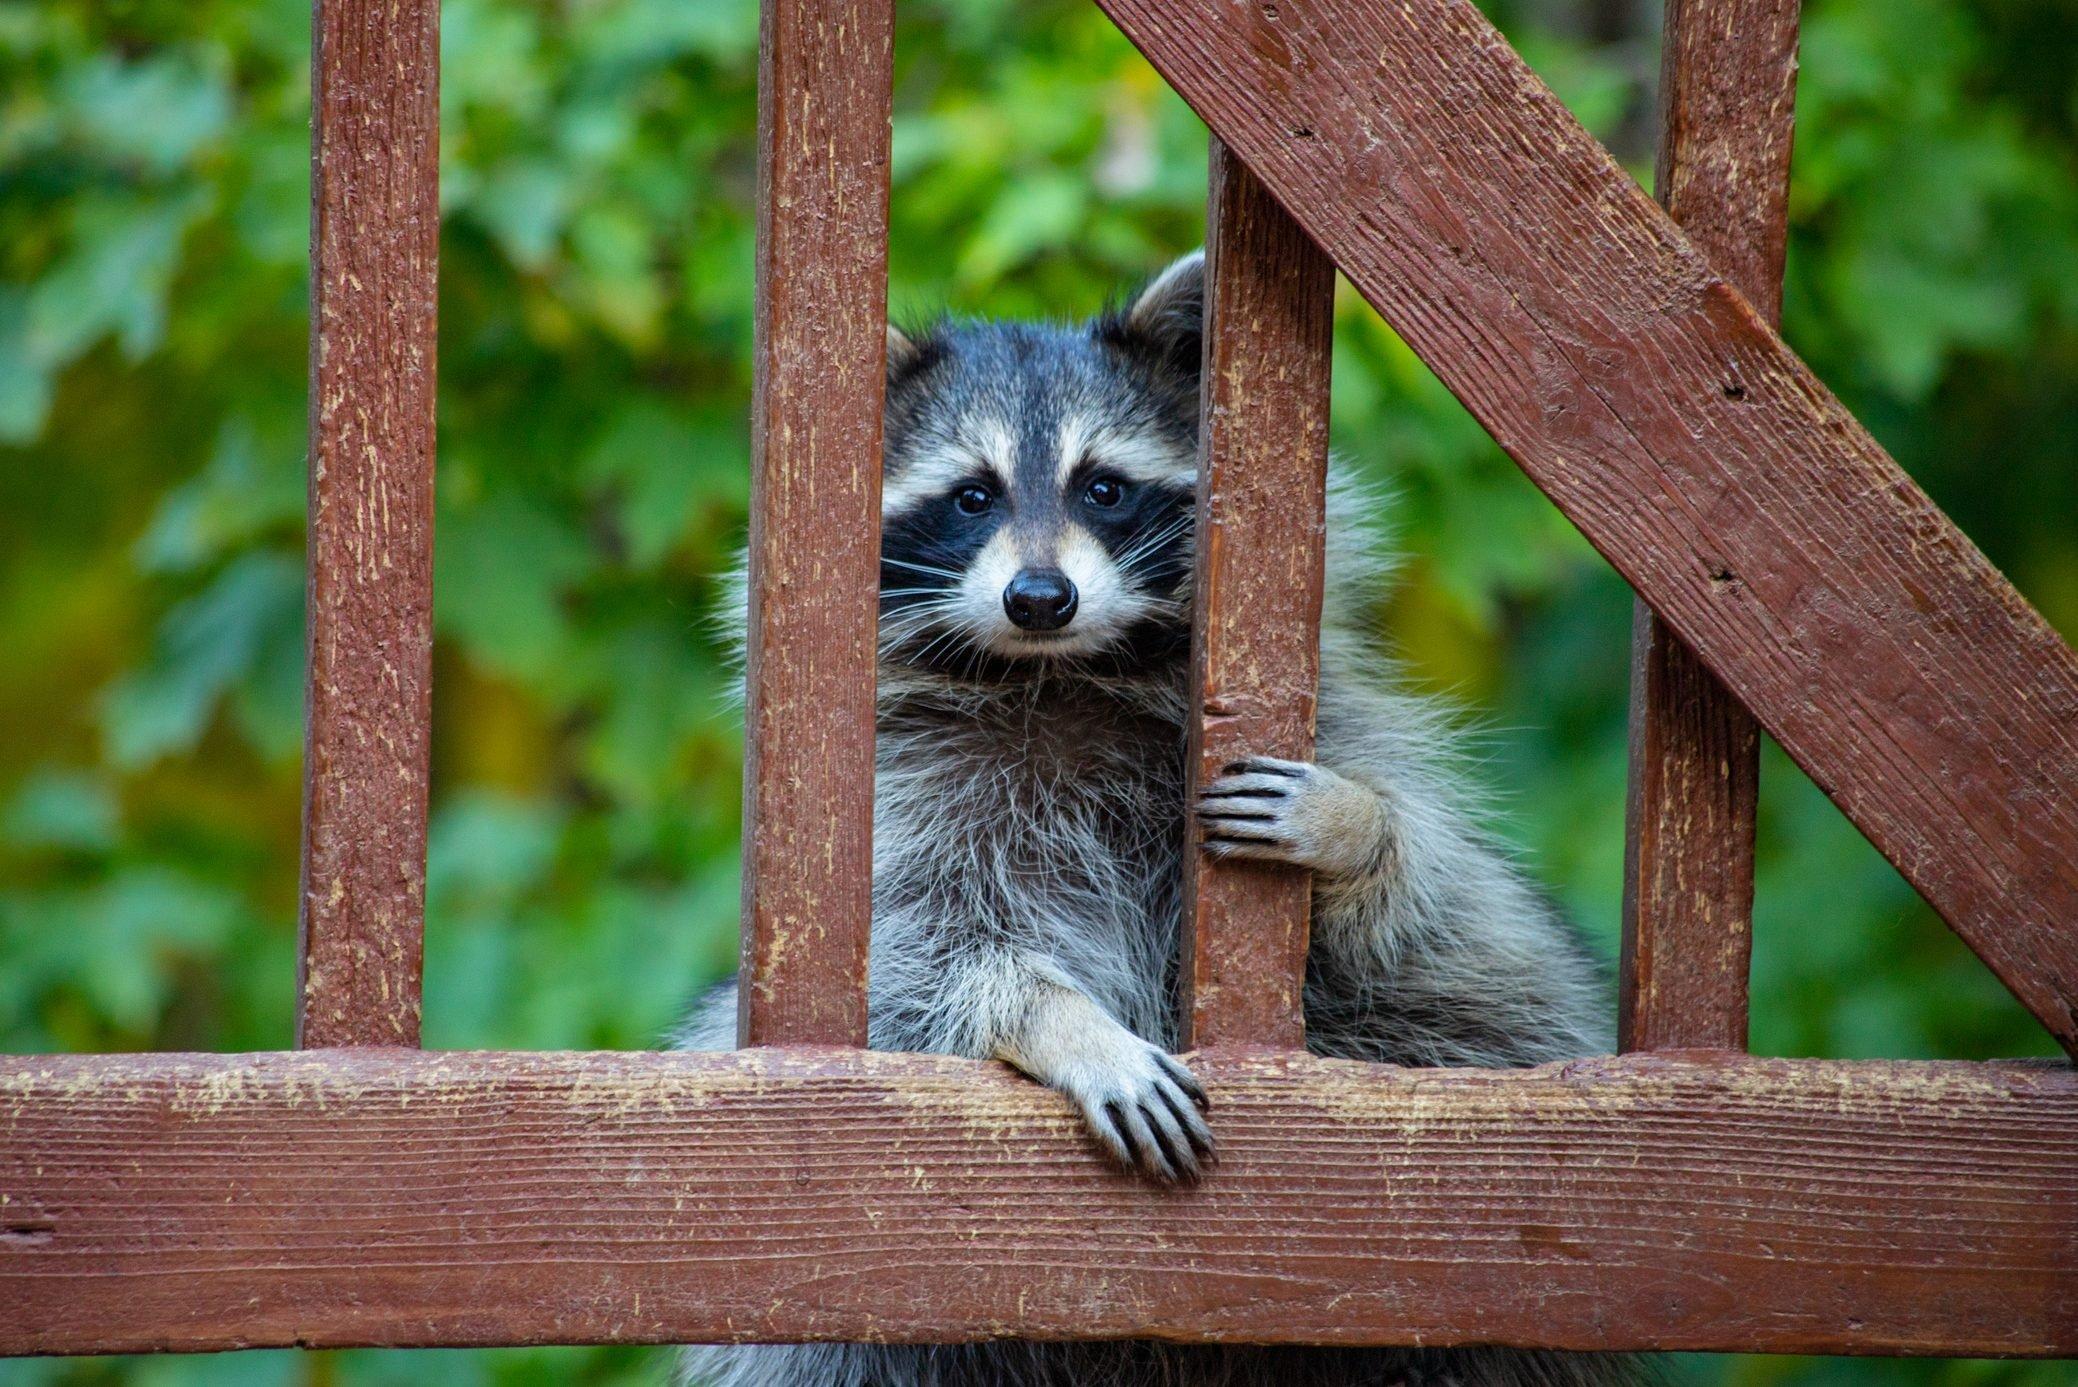 Raccoon Peering Through A Gate